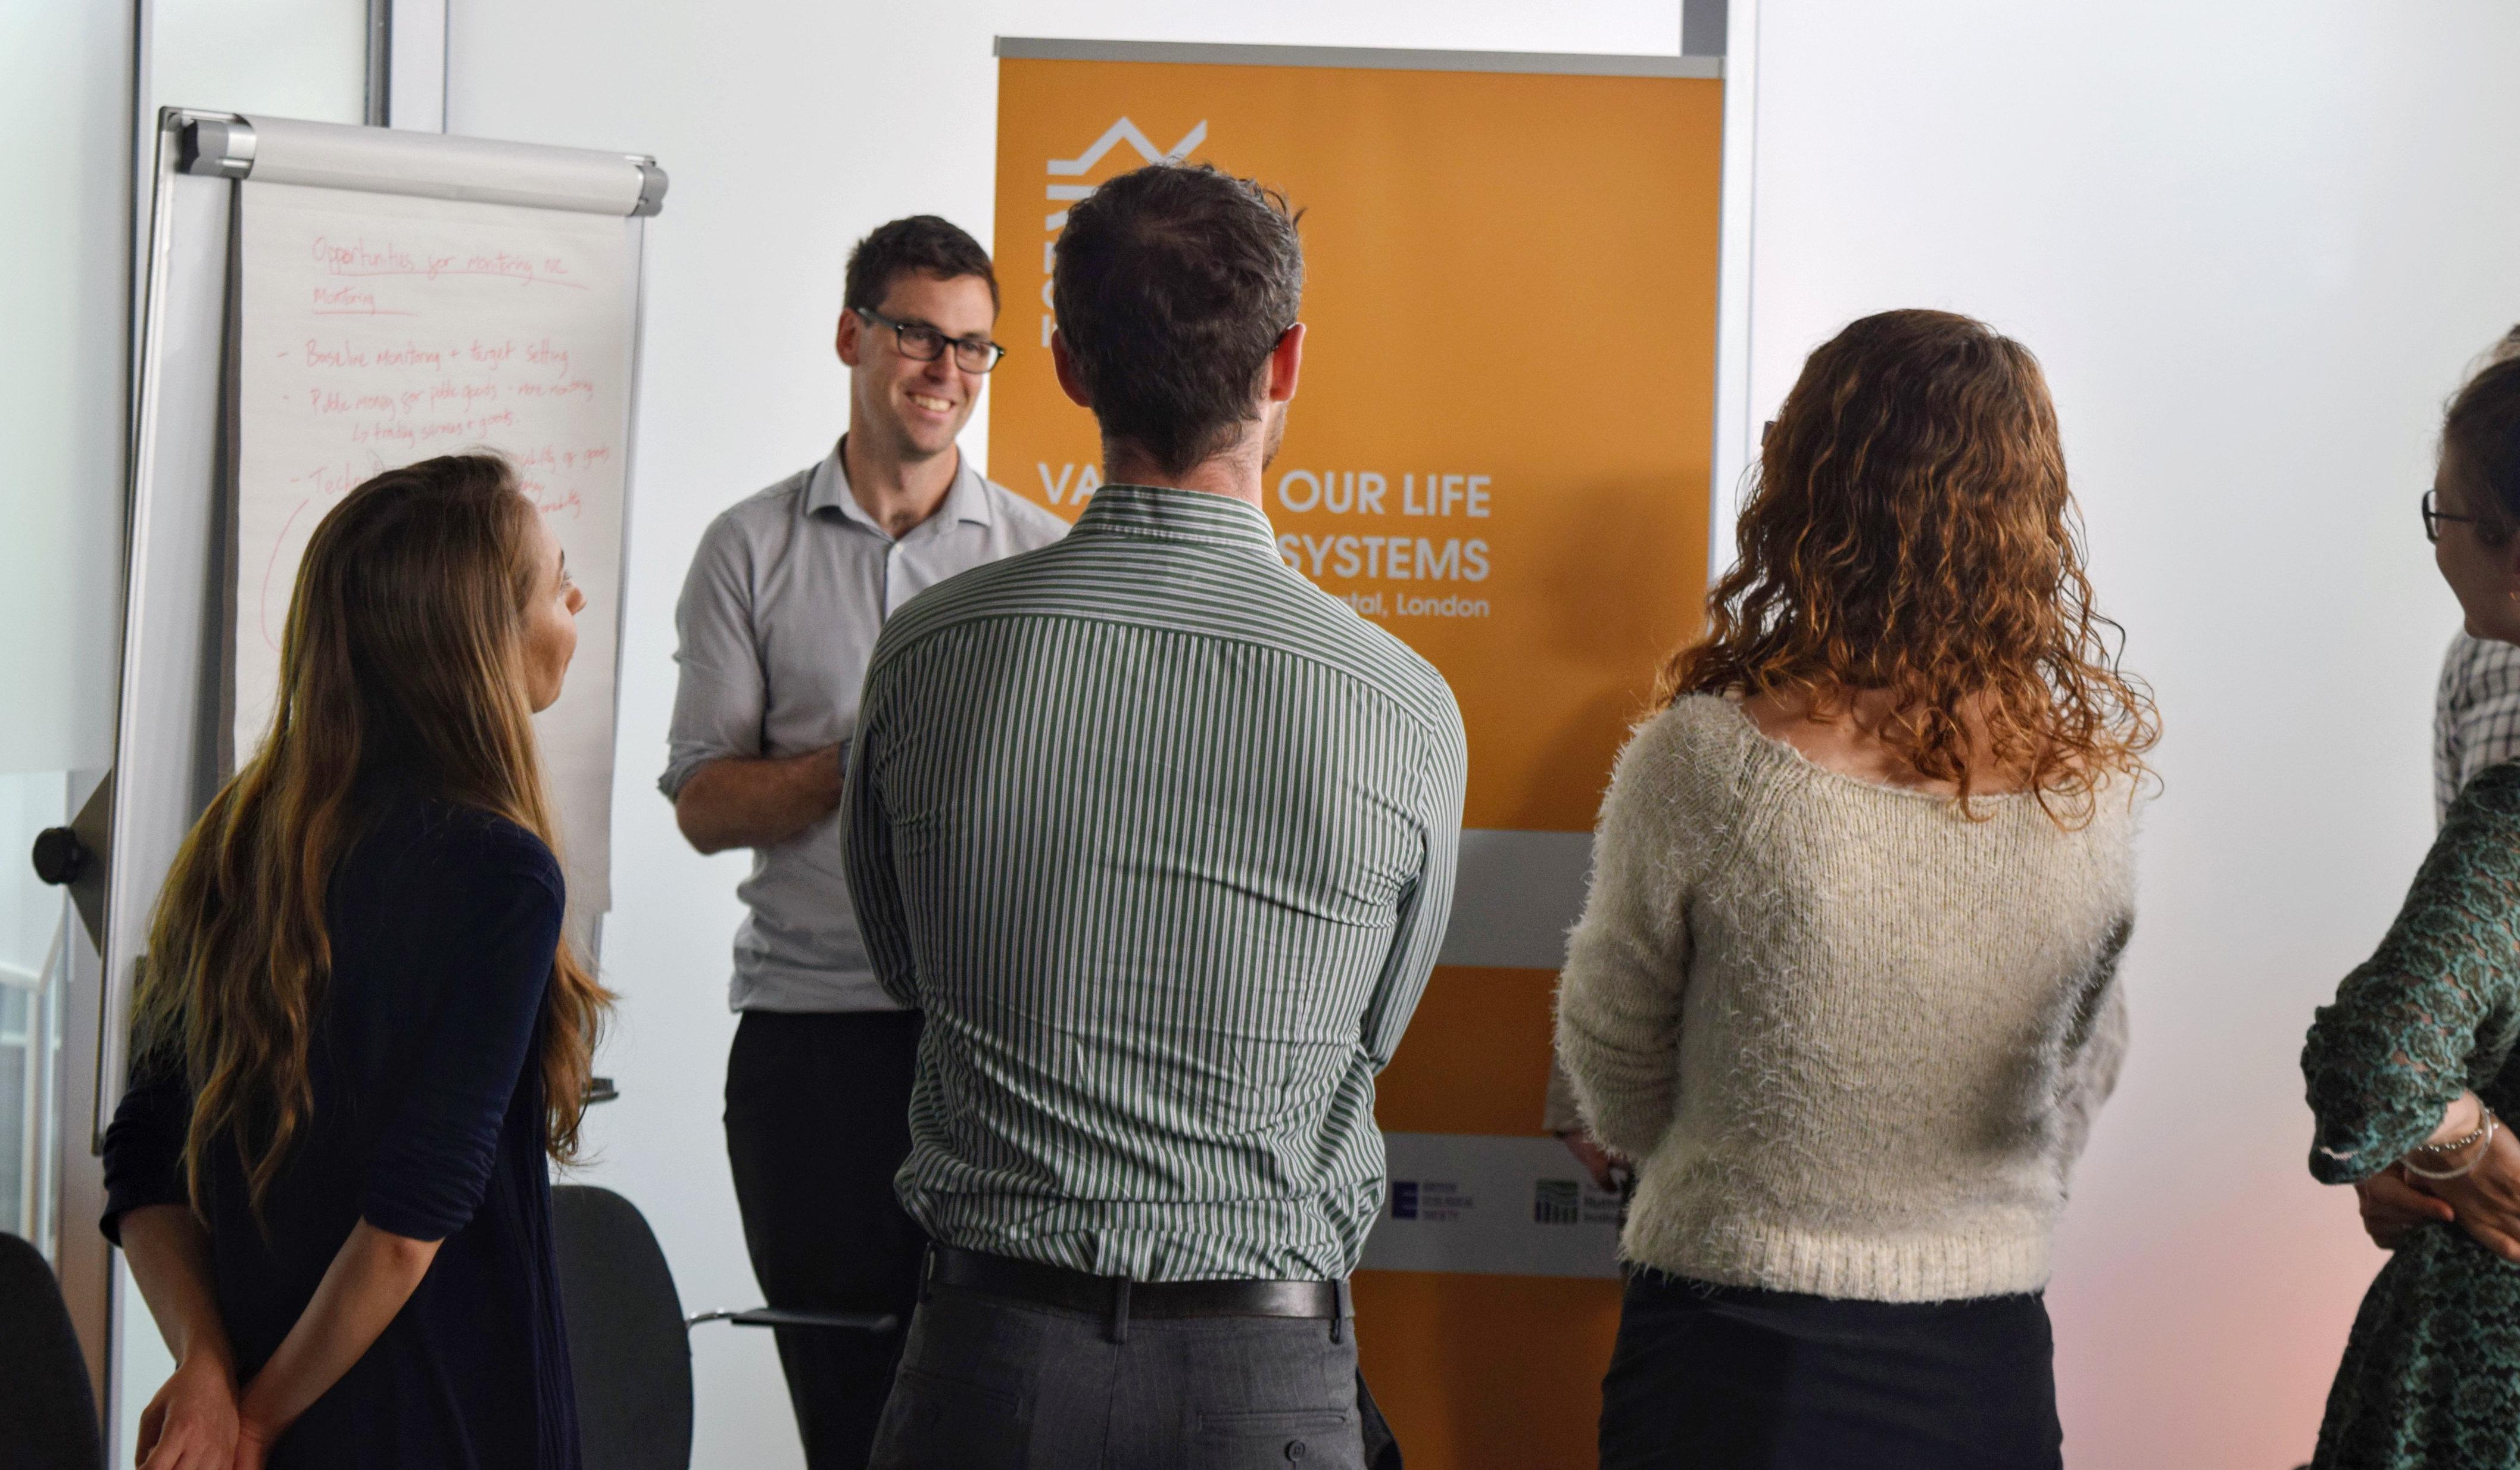 Delegates at the UKEOF workshop. Photo by Matt Harwood, Royal Society of Biology